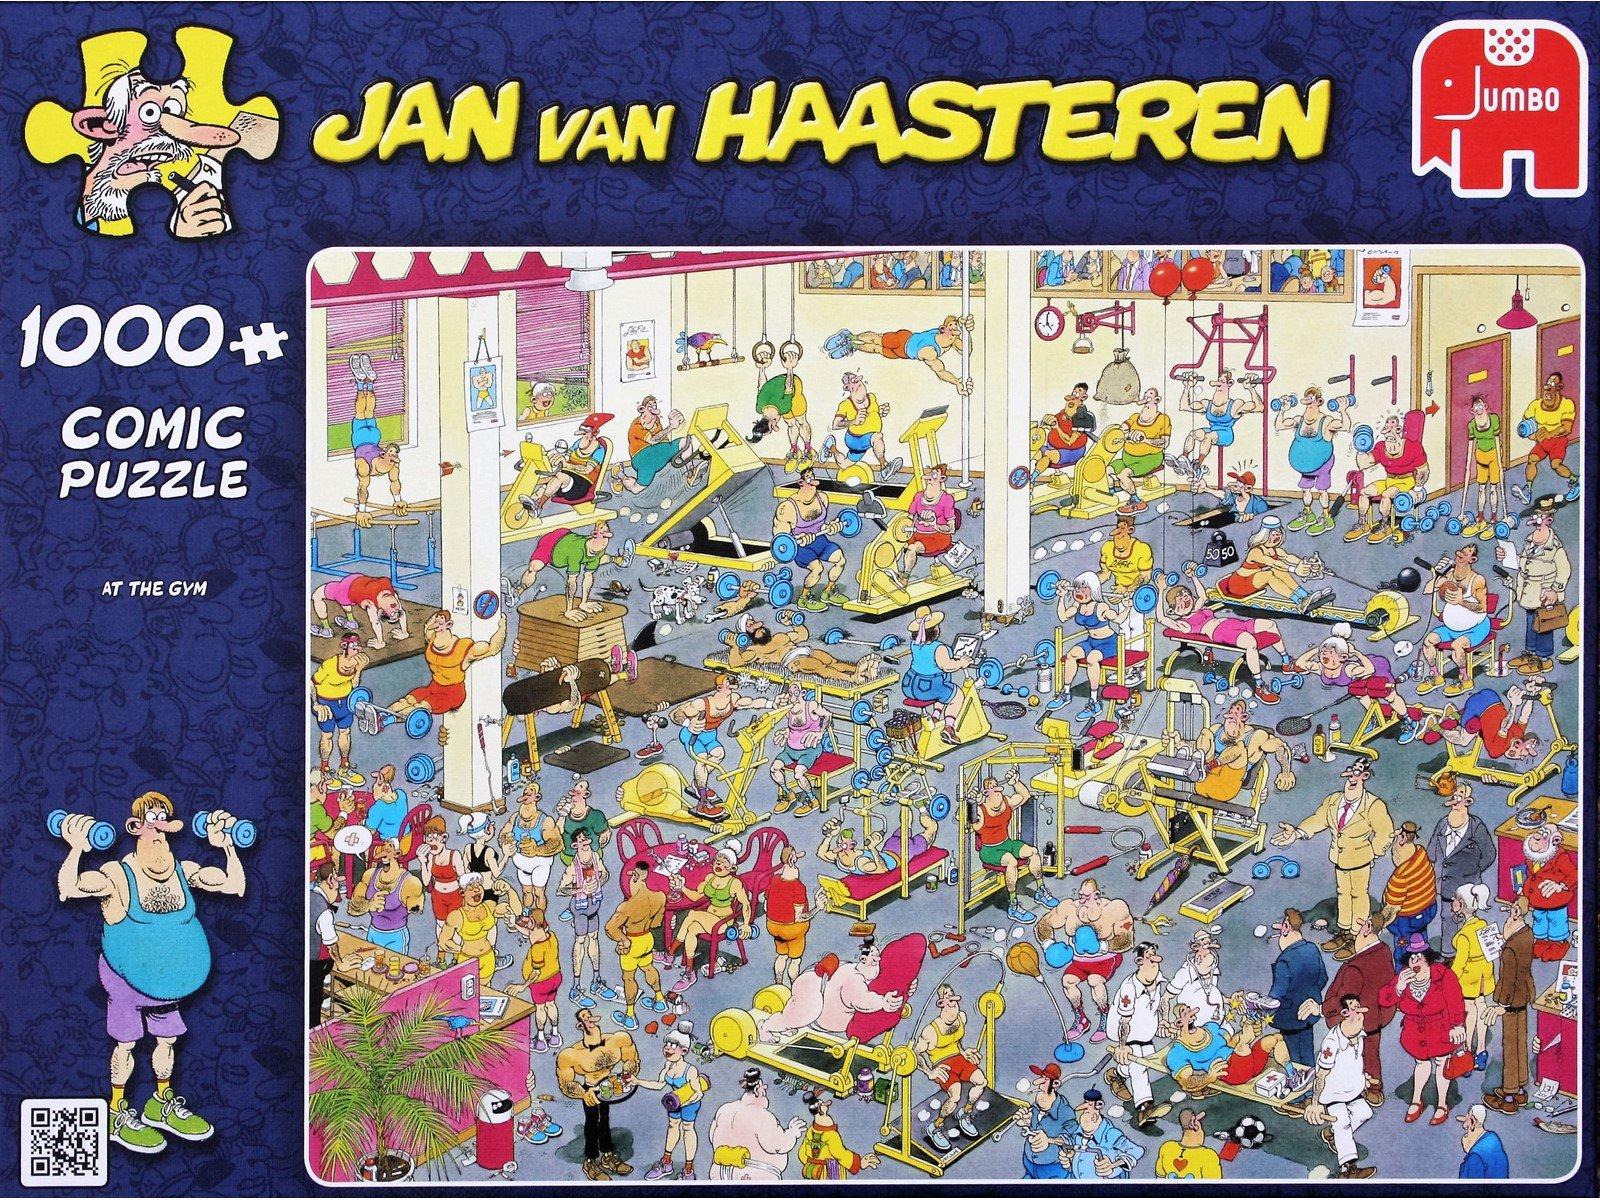 Jan van Haasteren - At the Gym - 1000 Piece Puzzle (81453K)